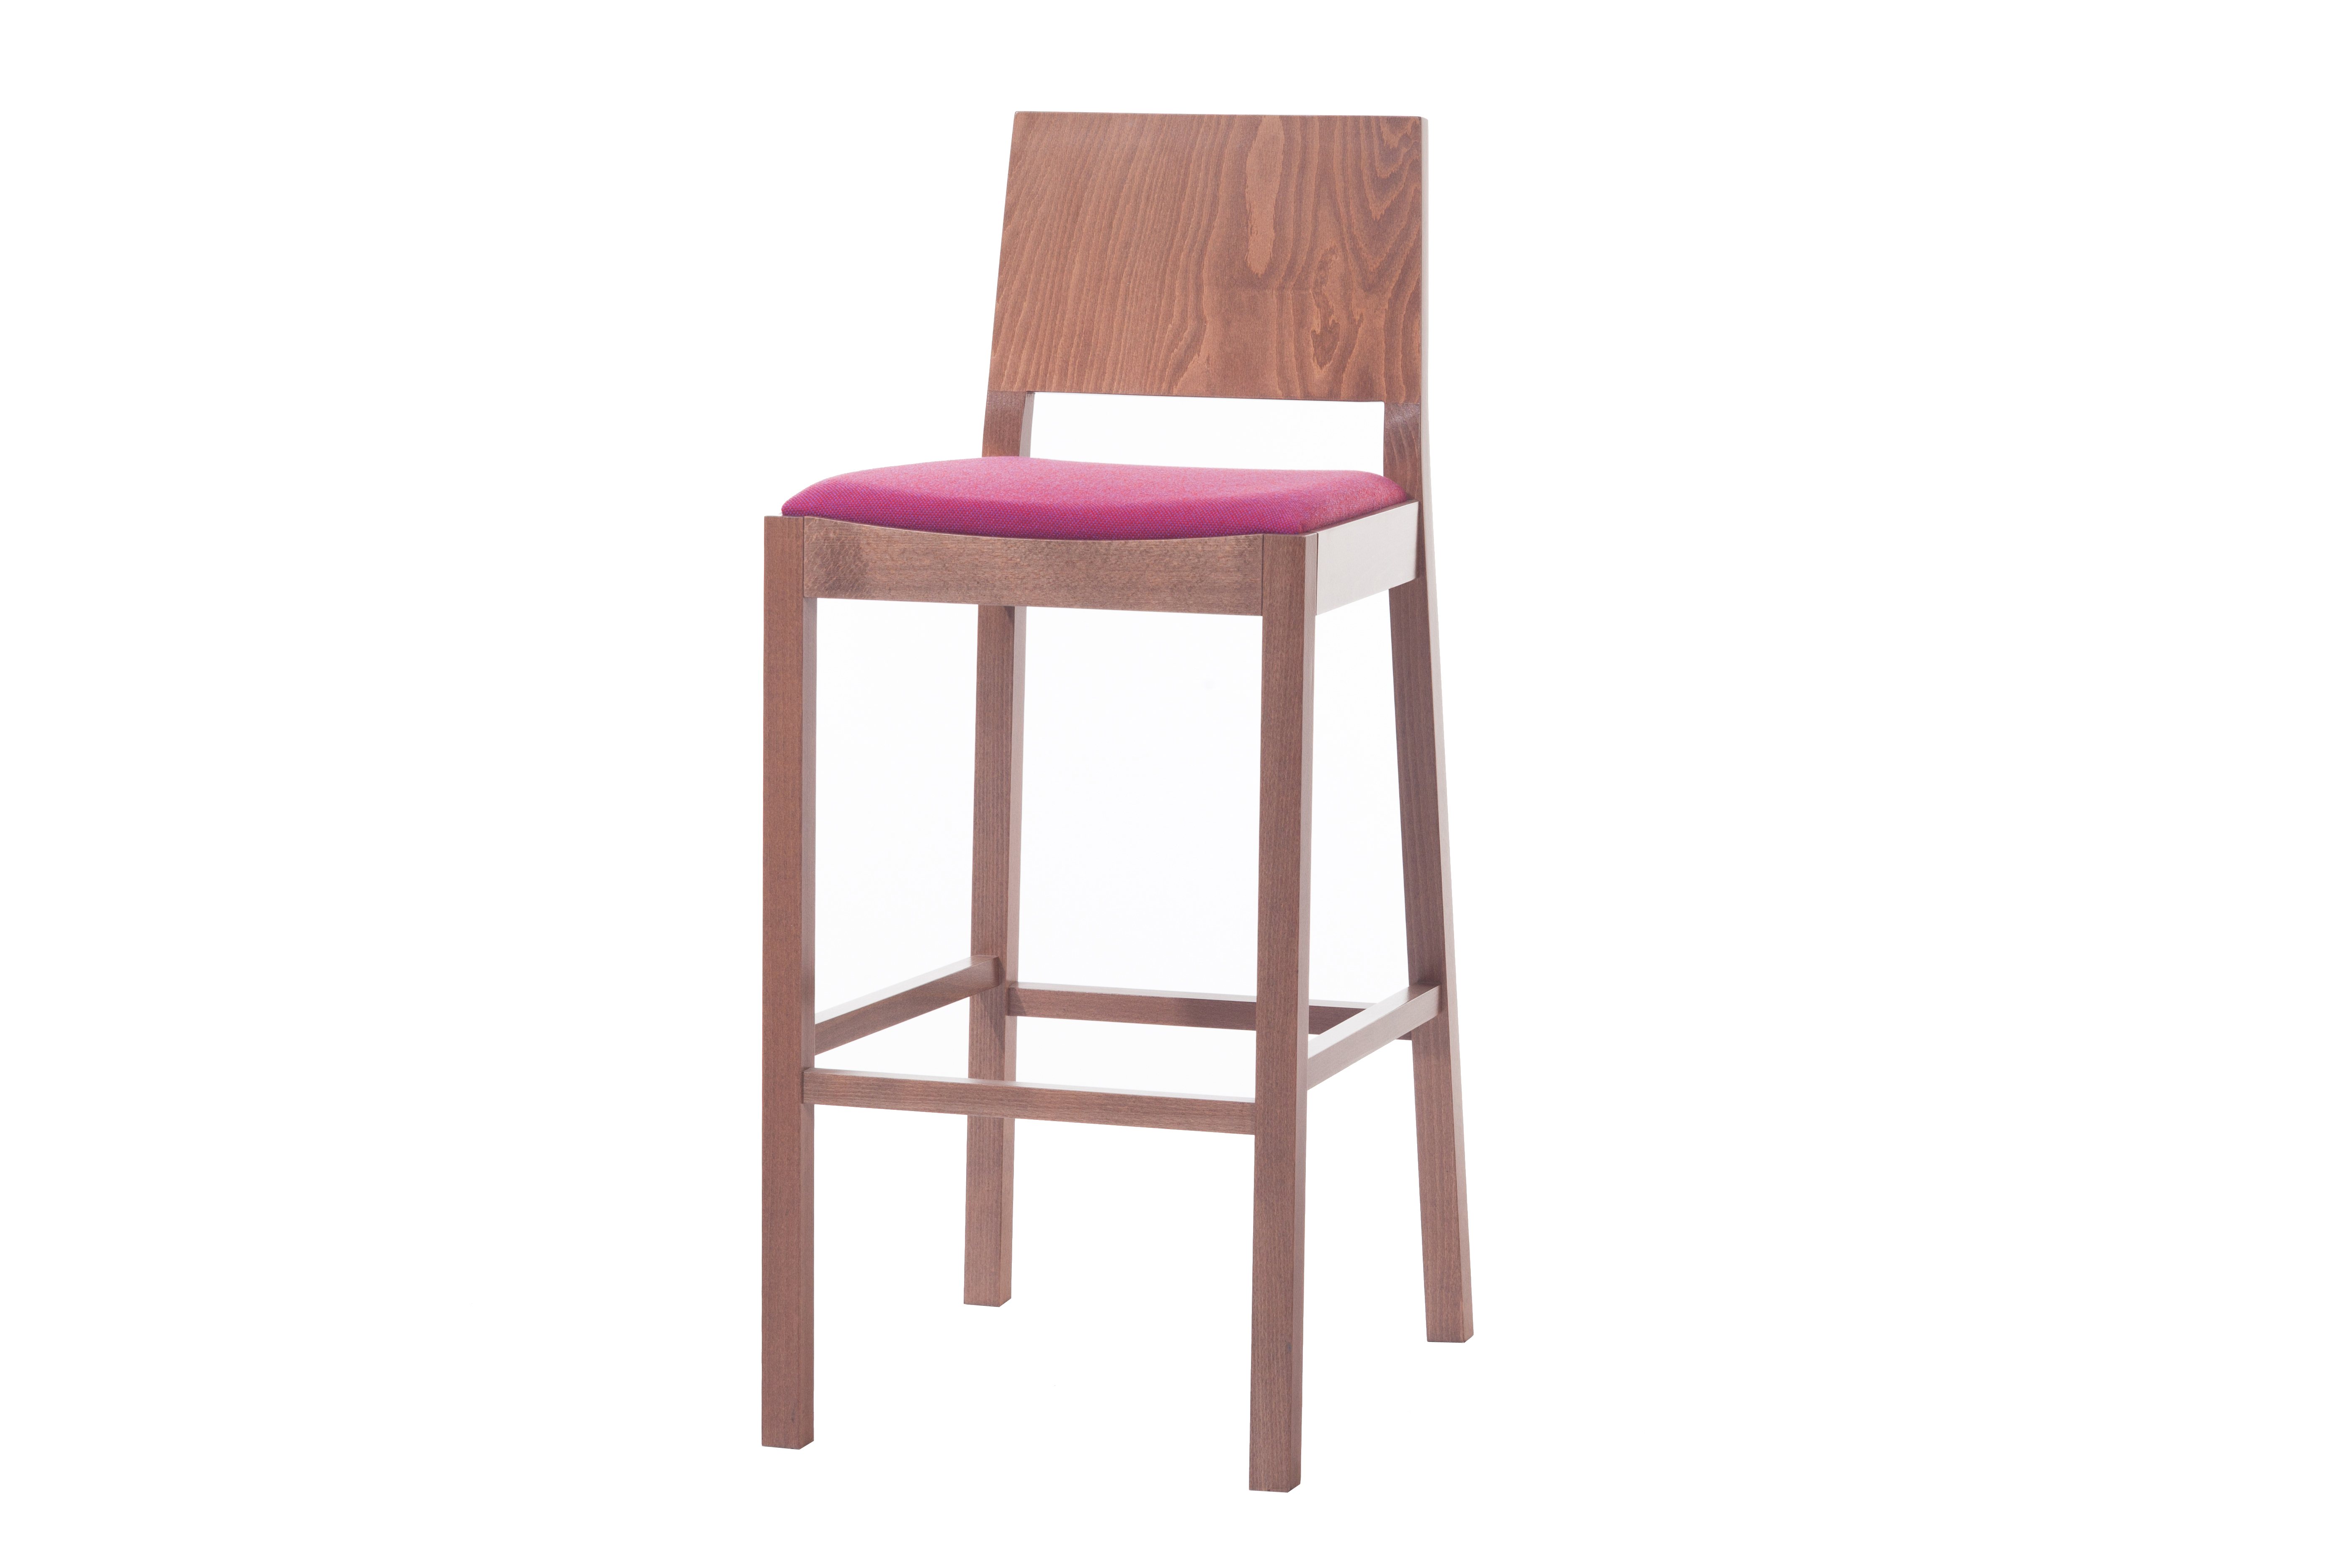 Scaun de bar tapitat din lemn de fag Lyon Walnut / Pink 515